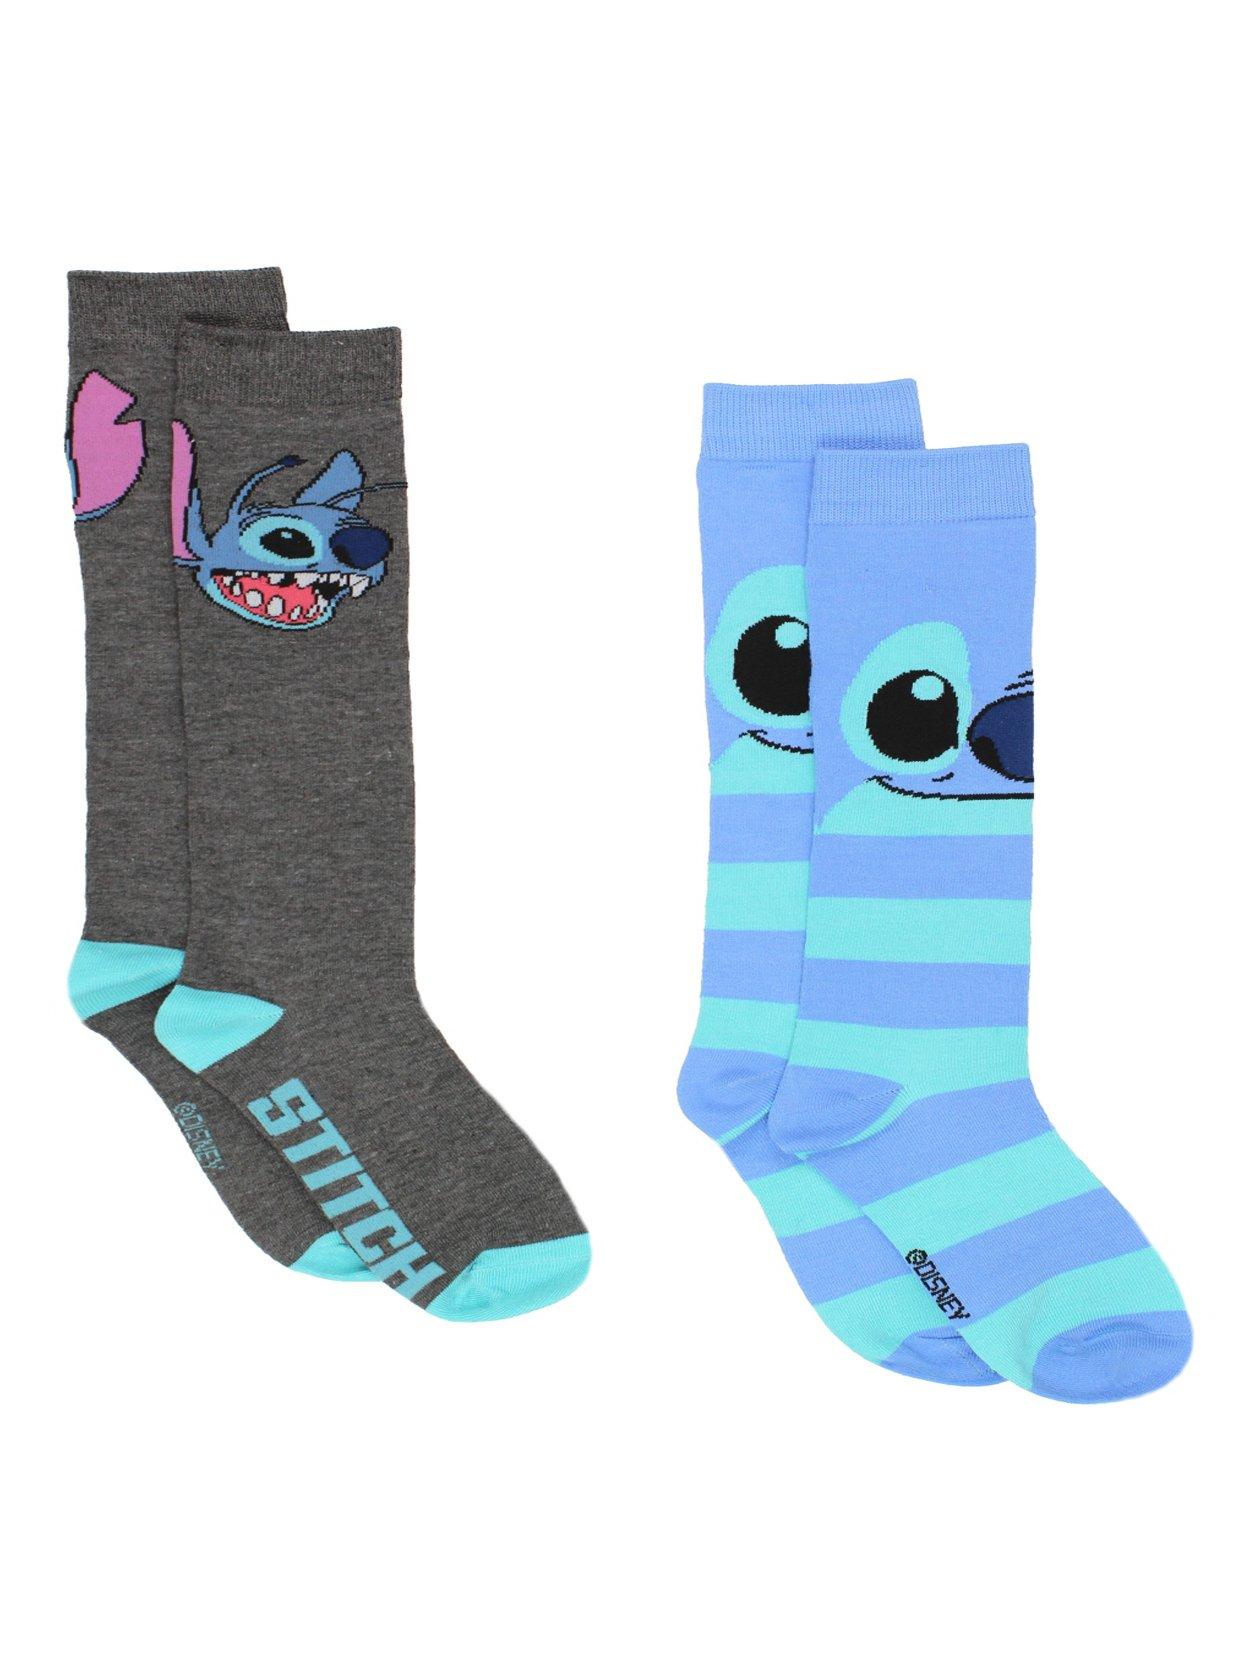 2 pack Knee High Socks (Big Kid/Teen/Adult)